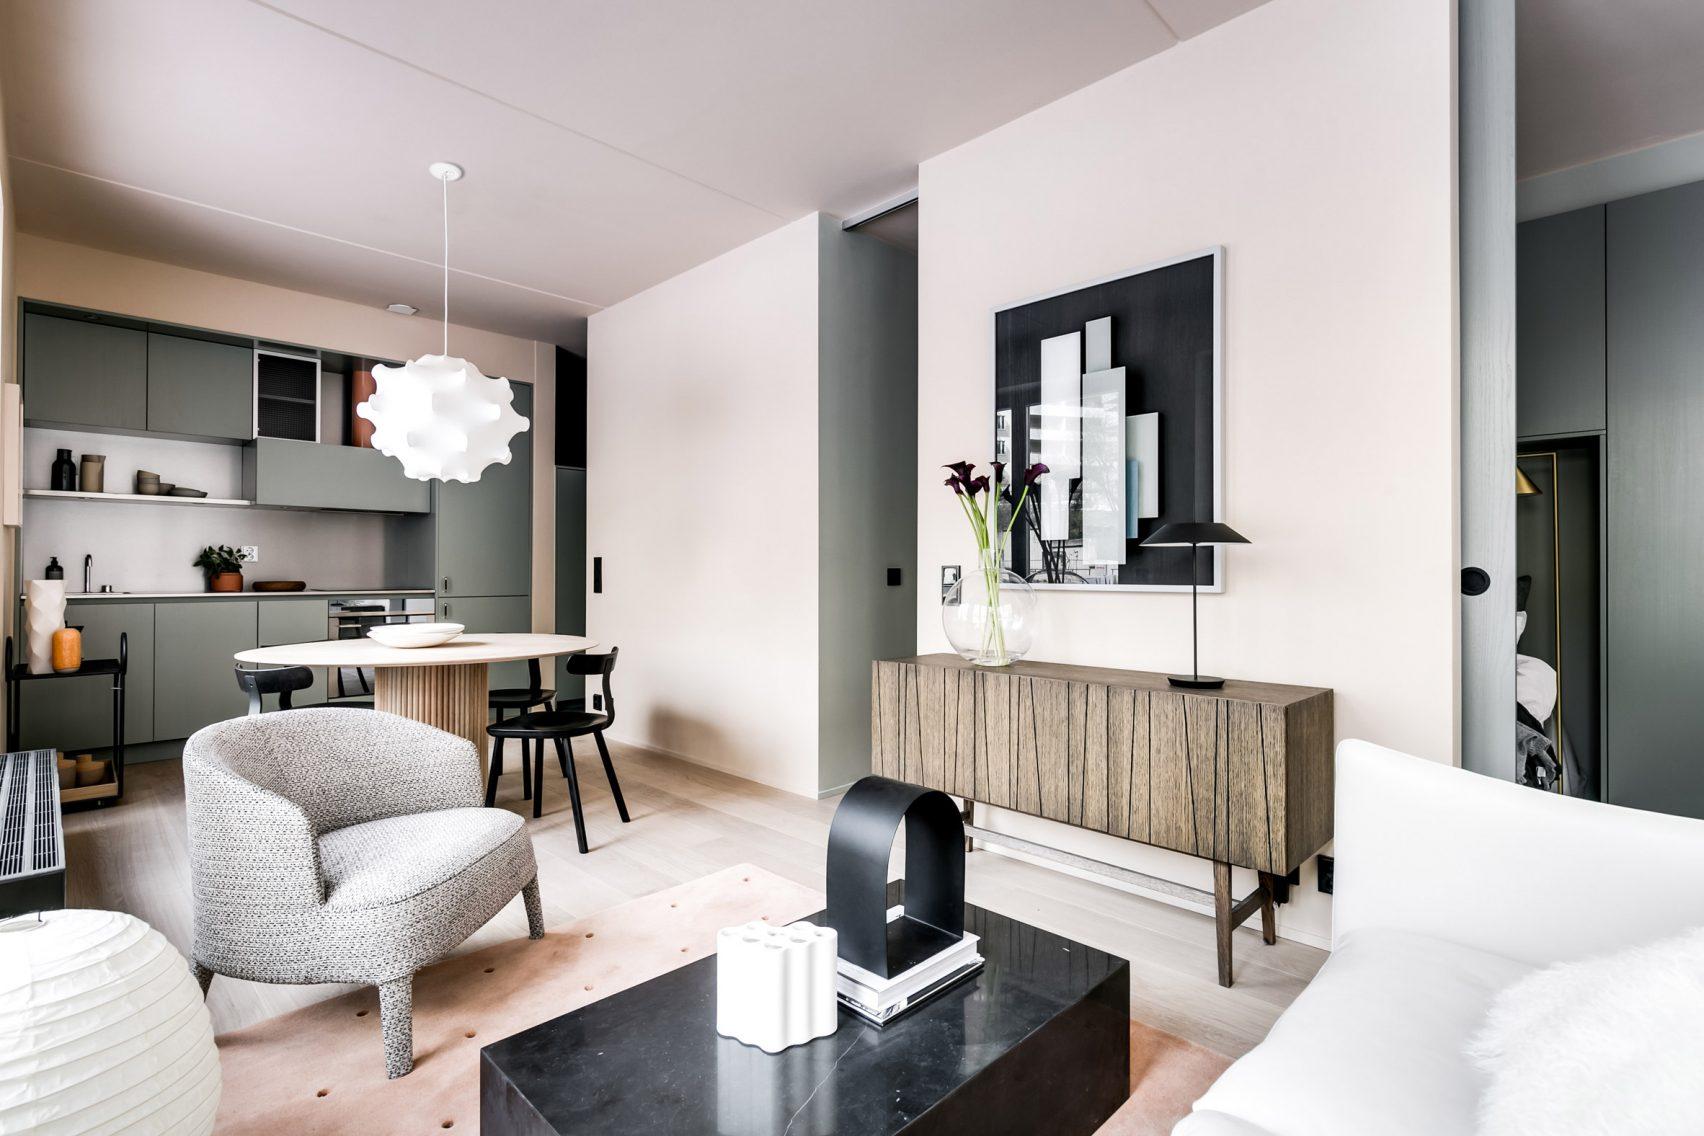 Idee originali per arredare case piccole di 40 o 50 mq for Case arredate ikea